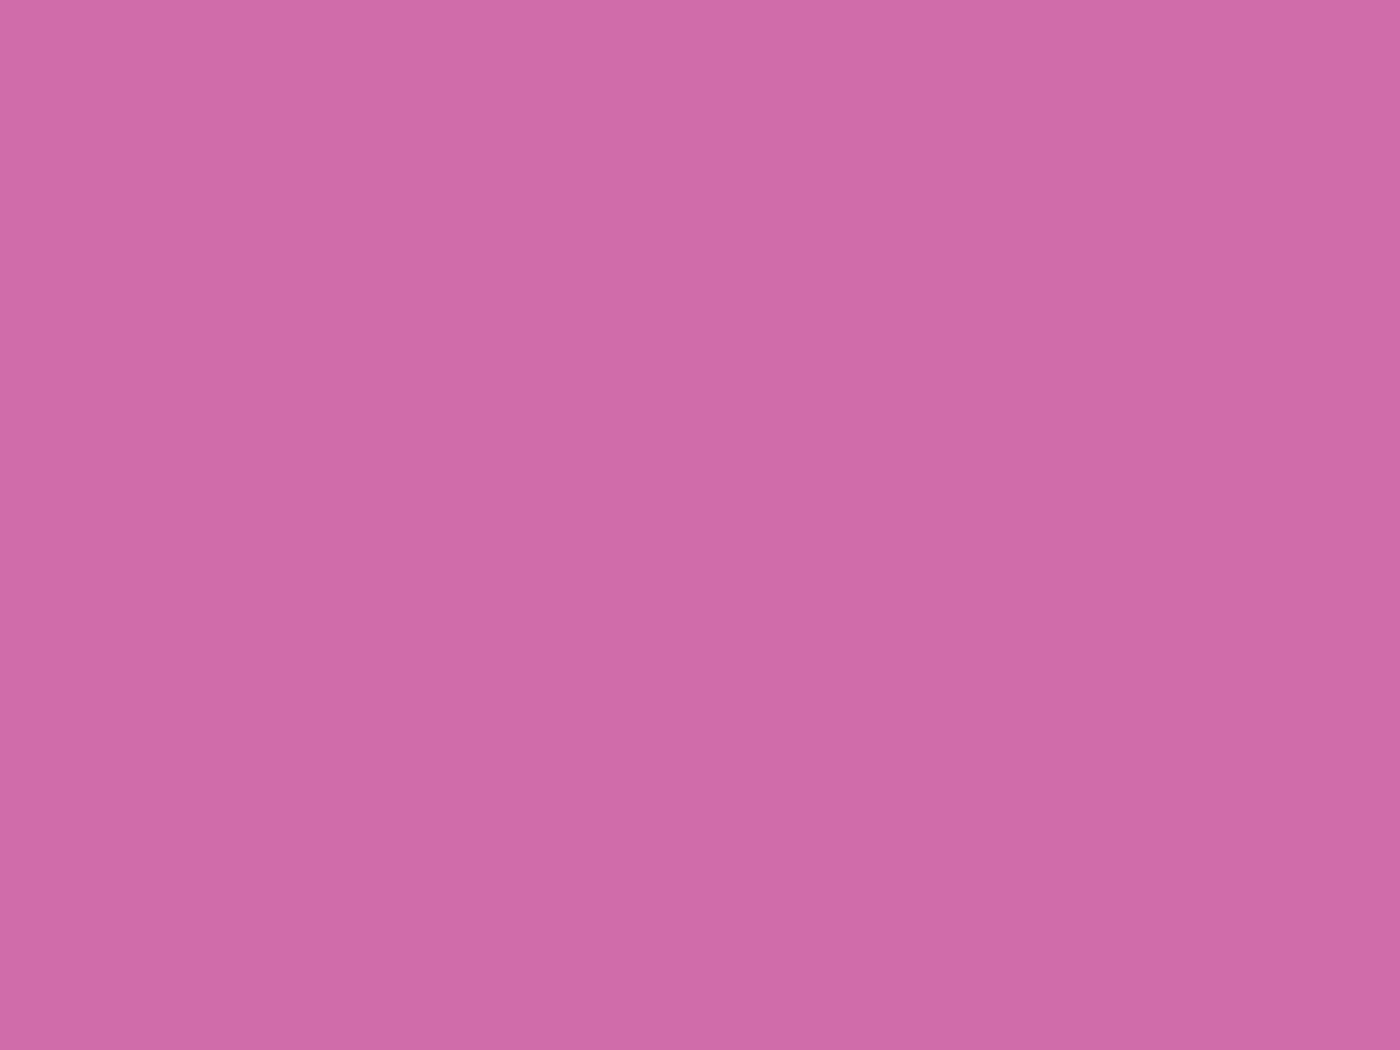 1400x1050 Super Pink Solid Color Background